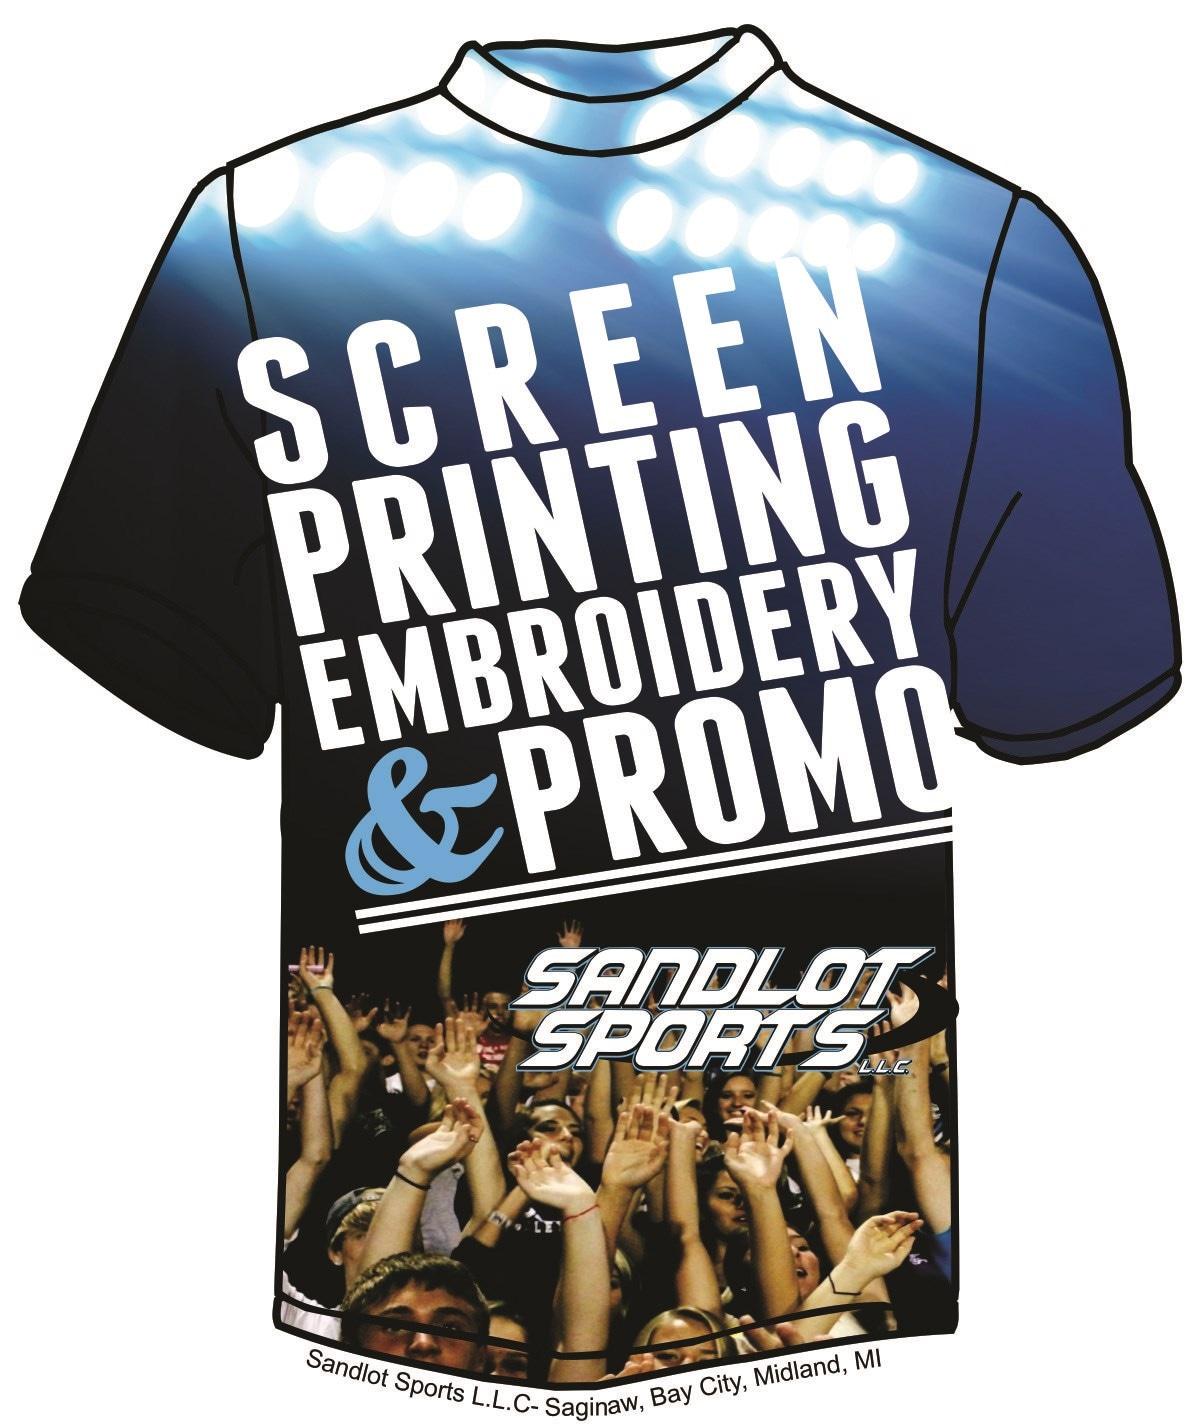 Sandlot Sports- Tee Shirt Printing and Embroidery